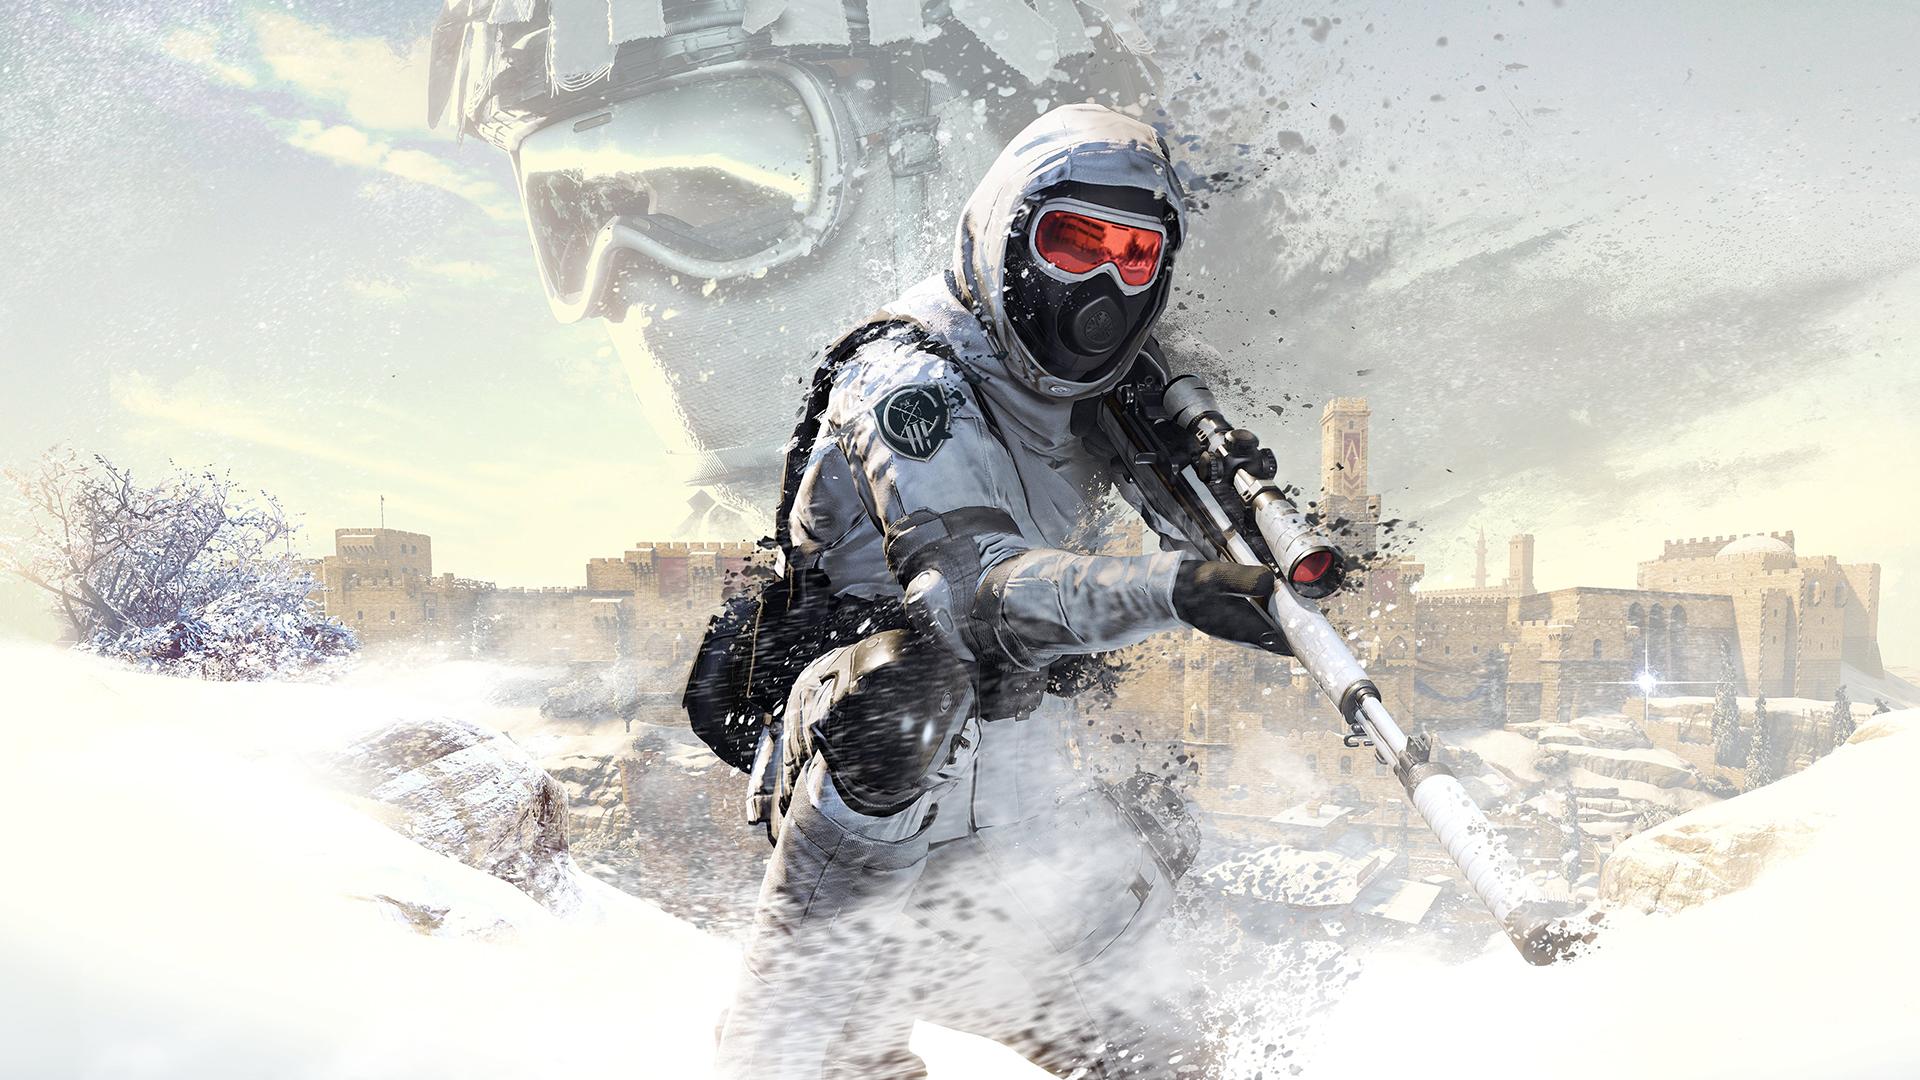 Insurgency: Sandstorm unveils and dates its next content update